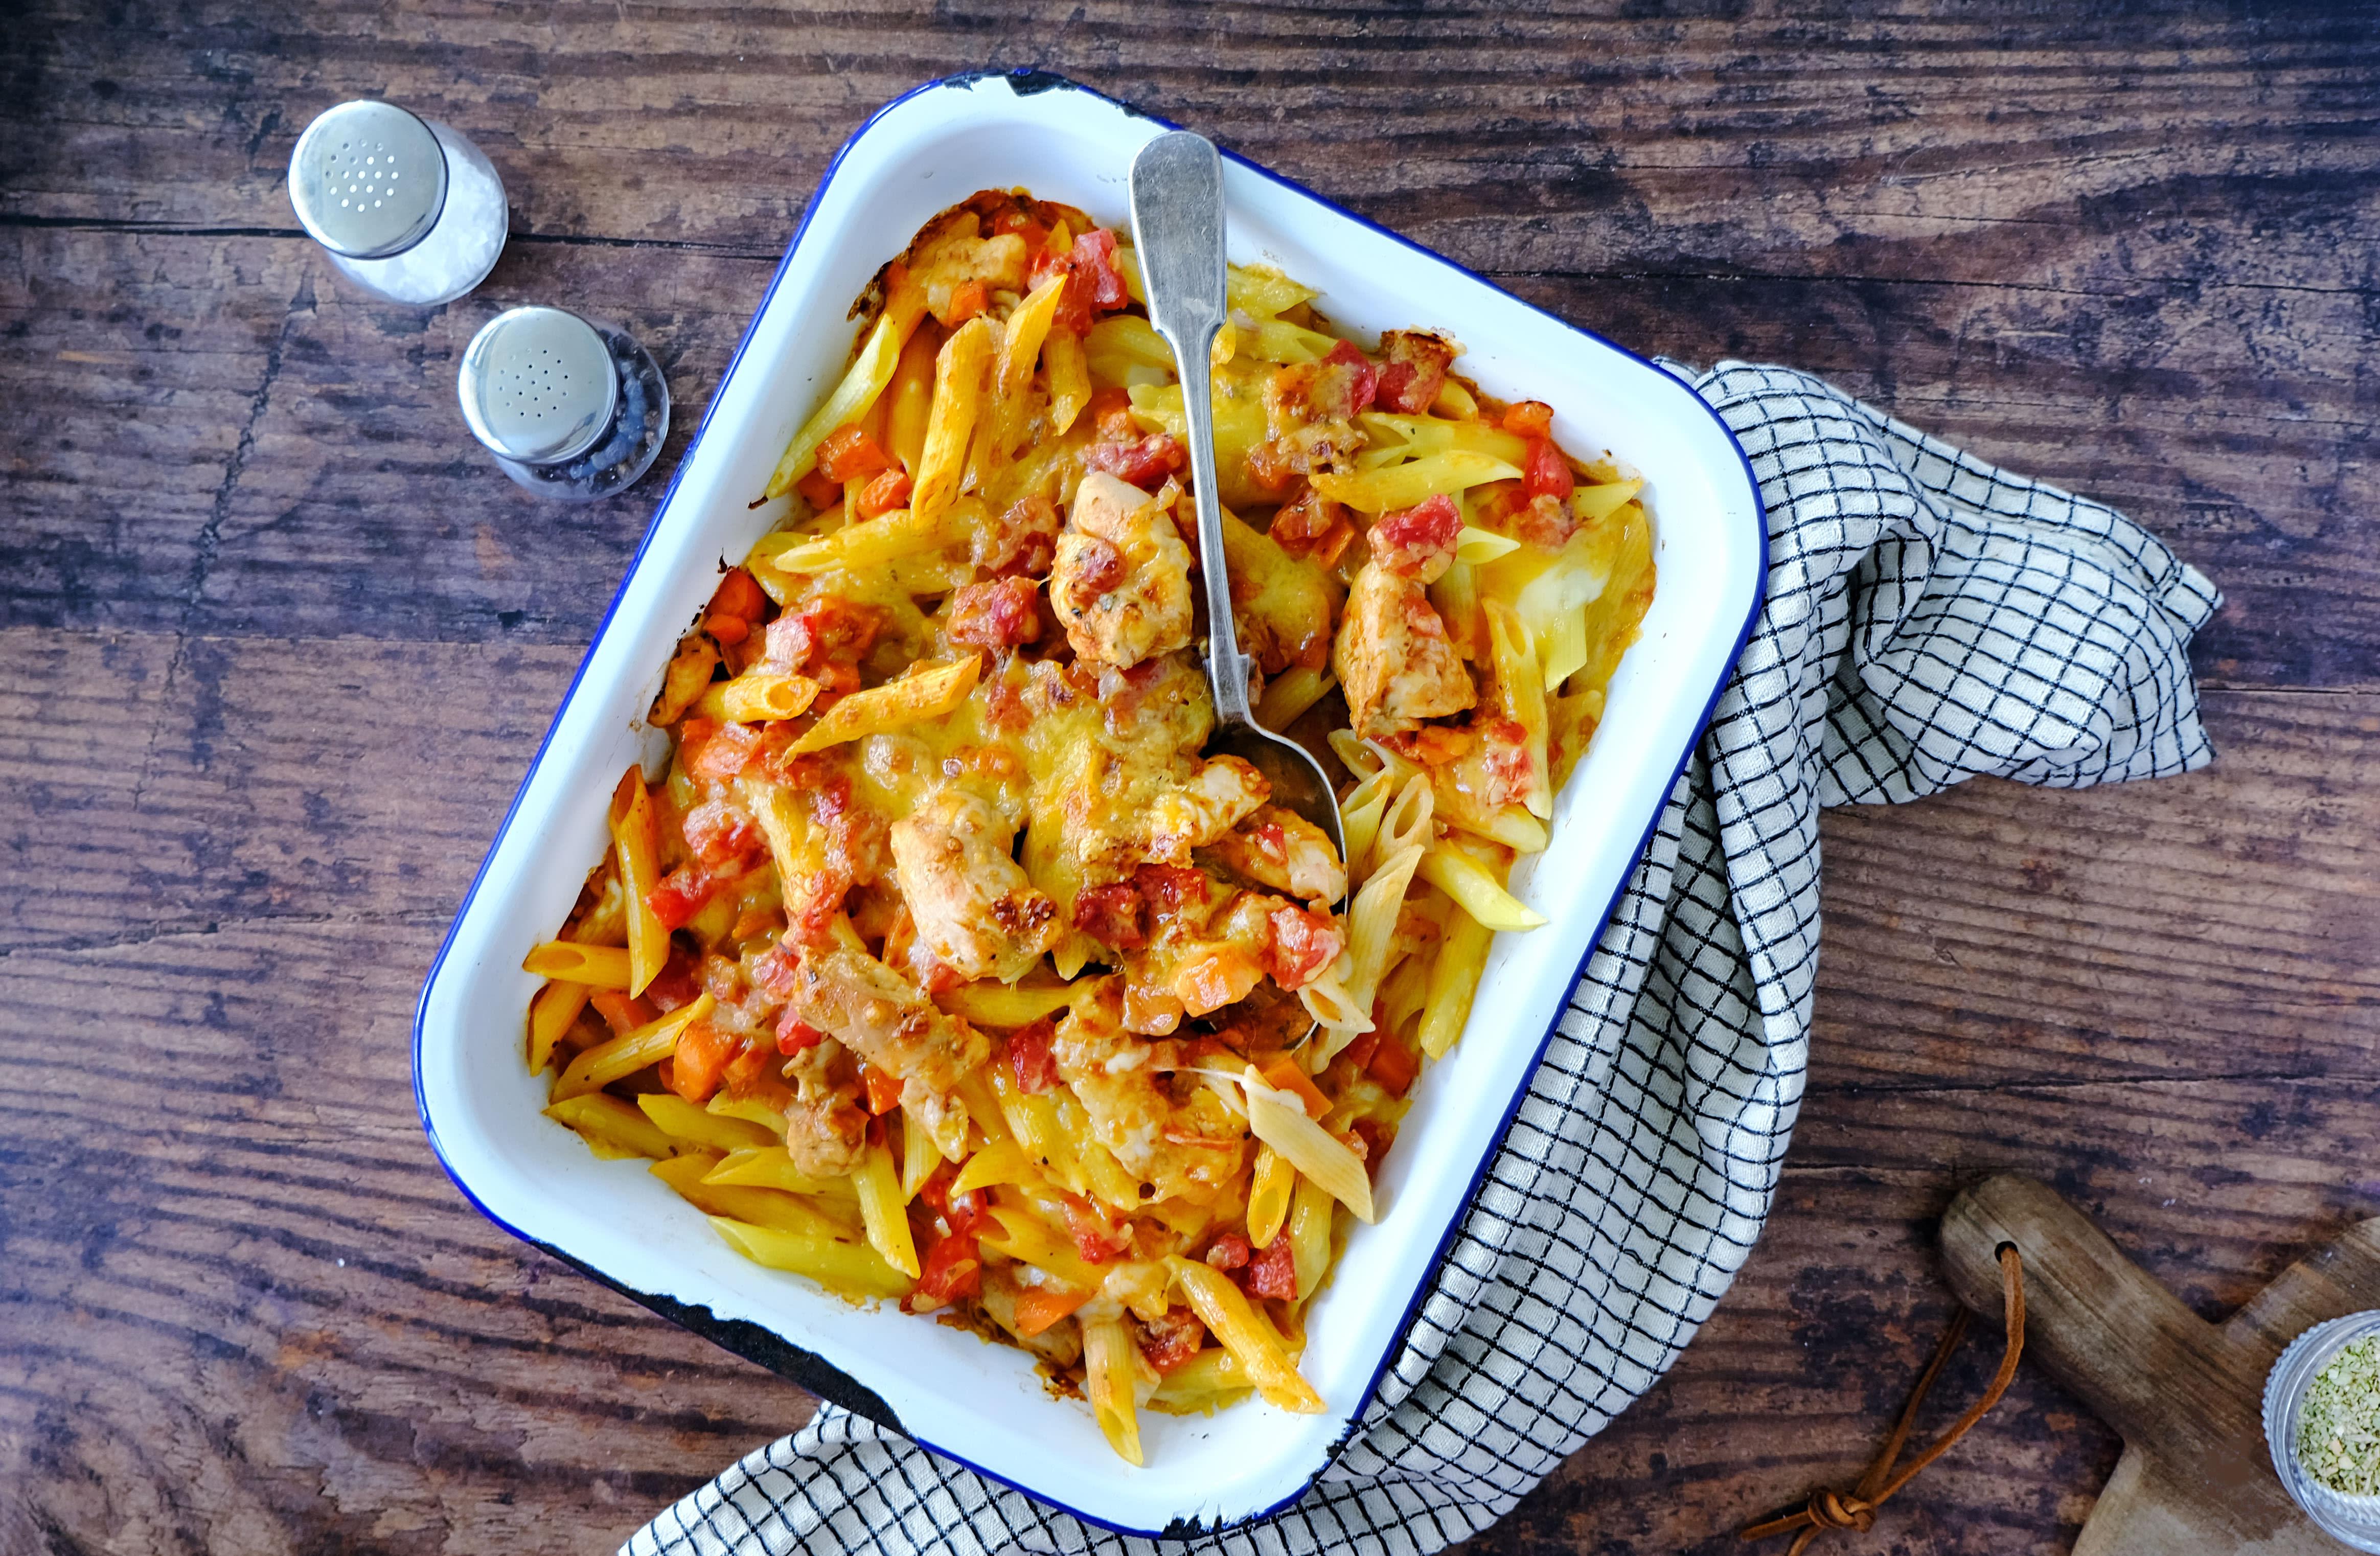 Cheesy Chicken and Tomato Pasta Bake